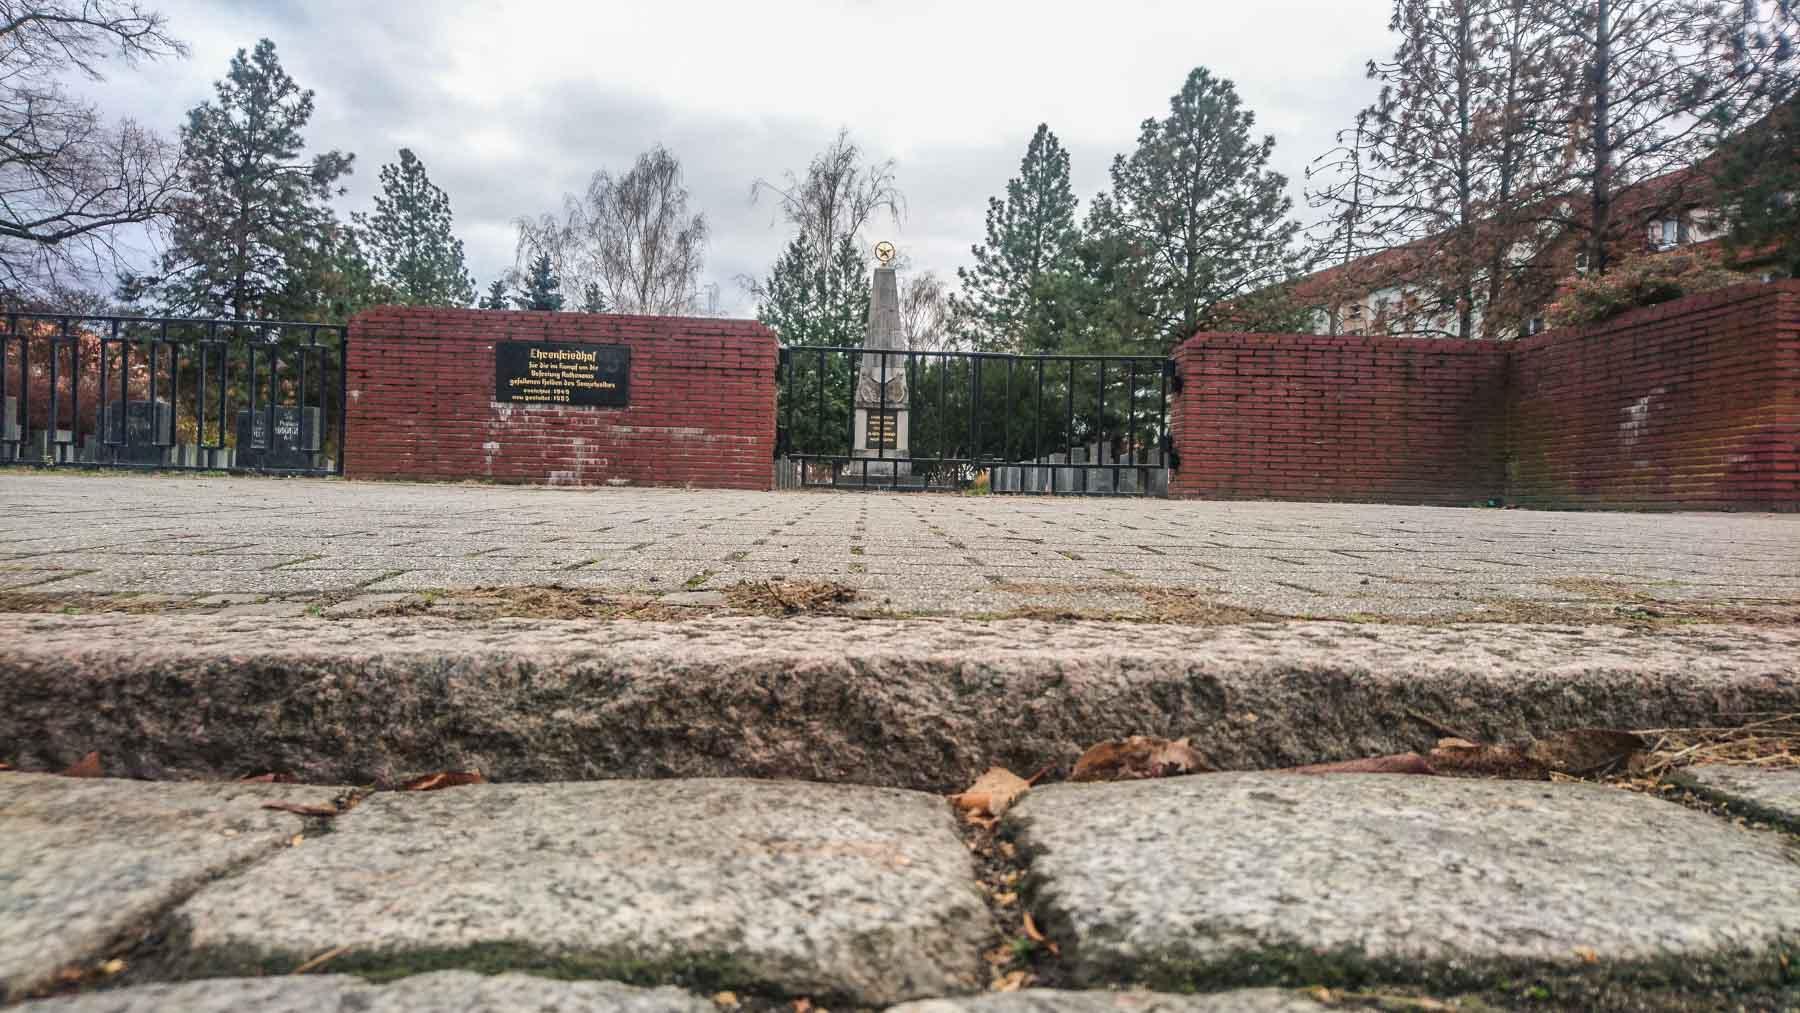 Sowjetischer Friedhof Rathenow